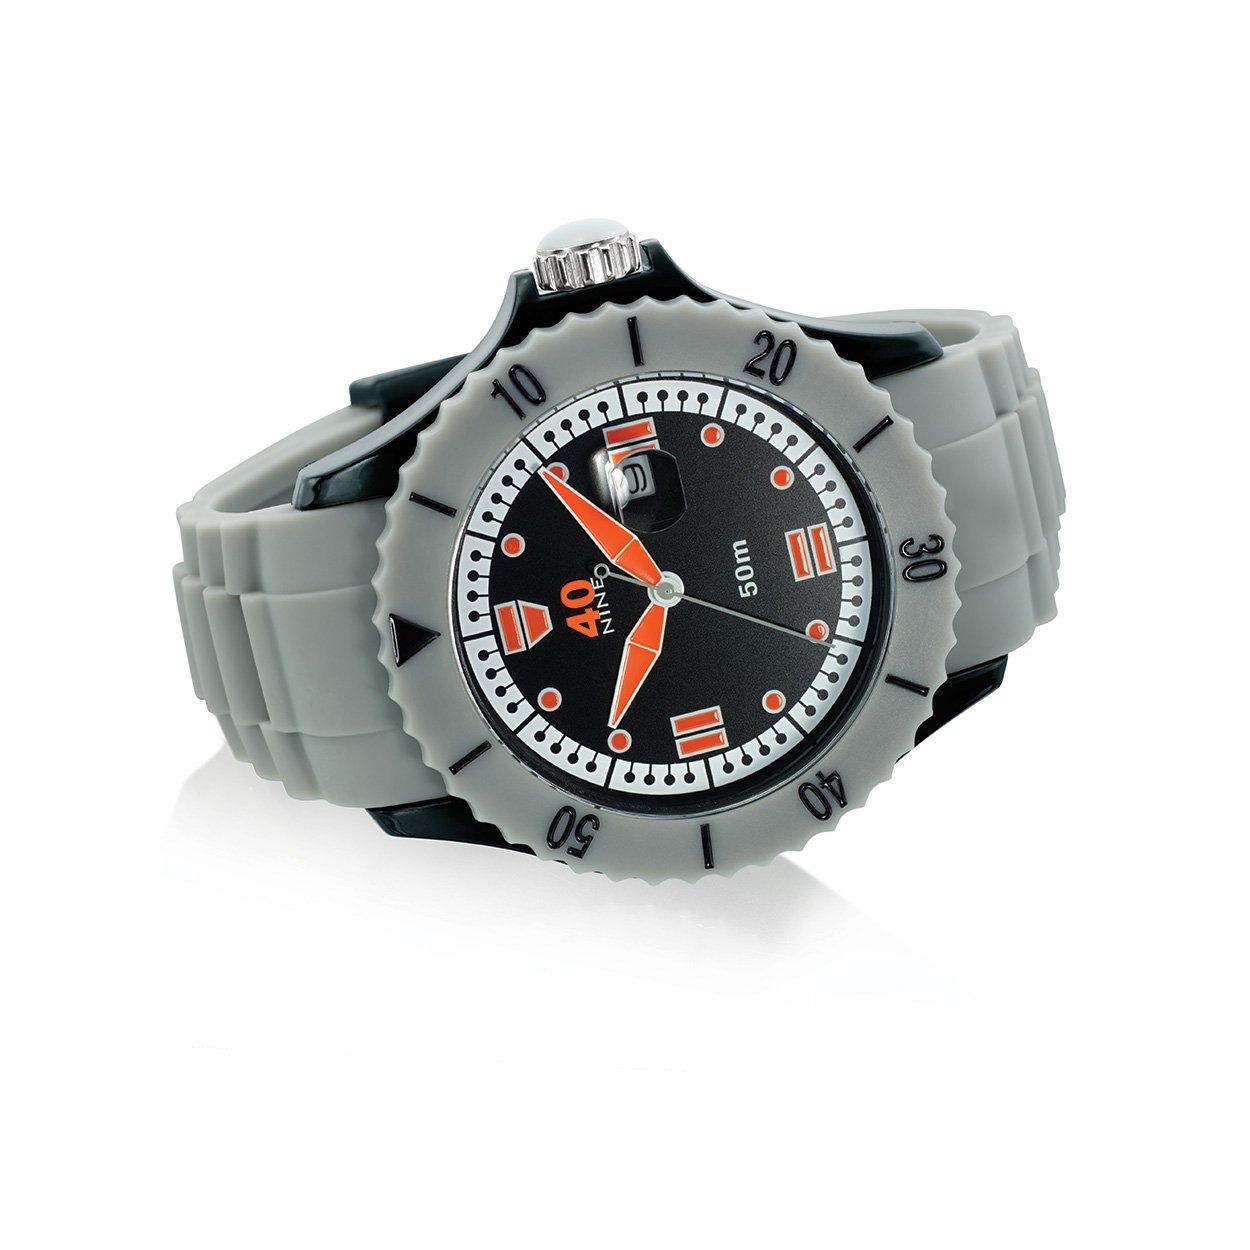 40Nine Men s Japanese-Quartz Watch with Silicone Strap, Grey, 26 Model 40NINE01 GREY20